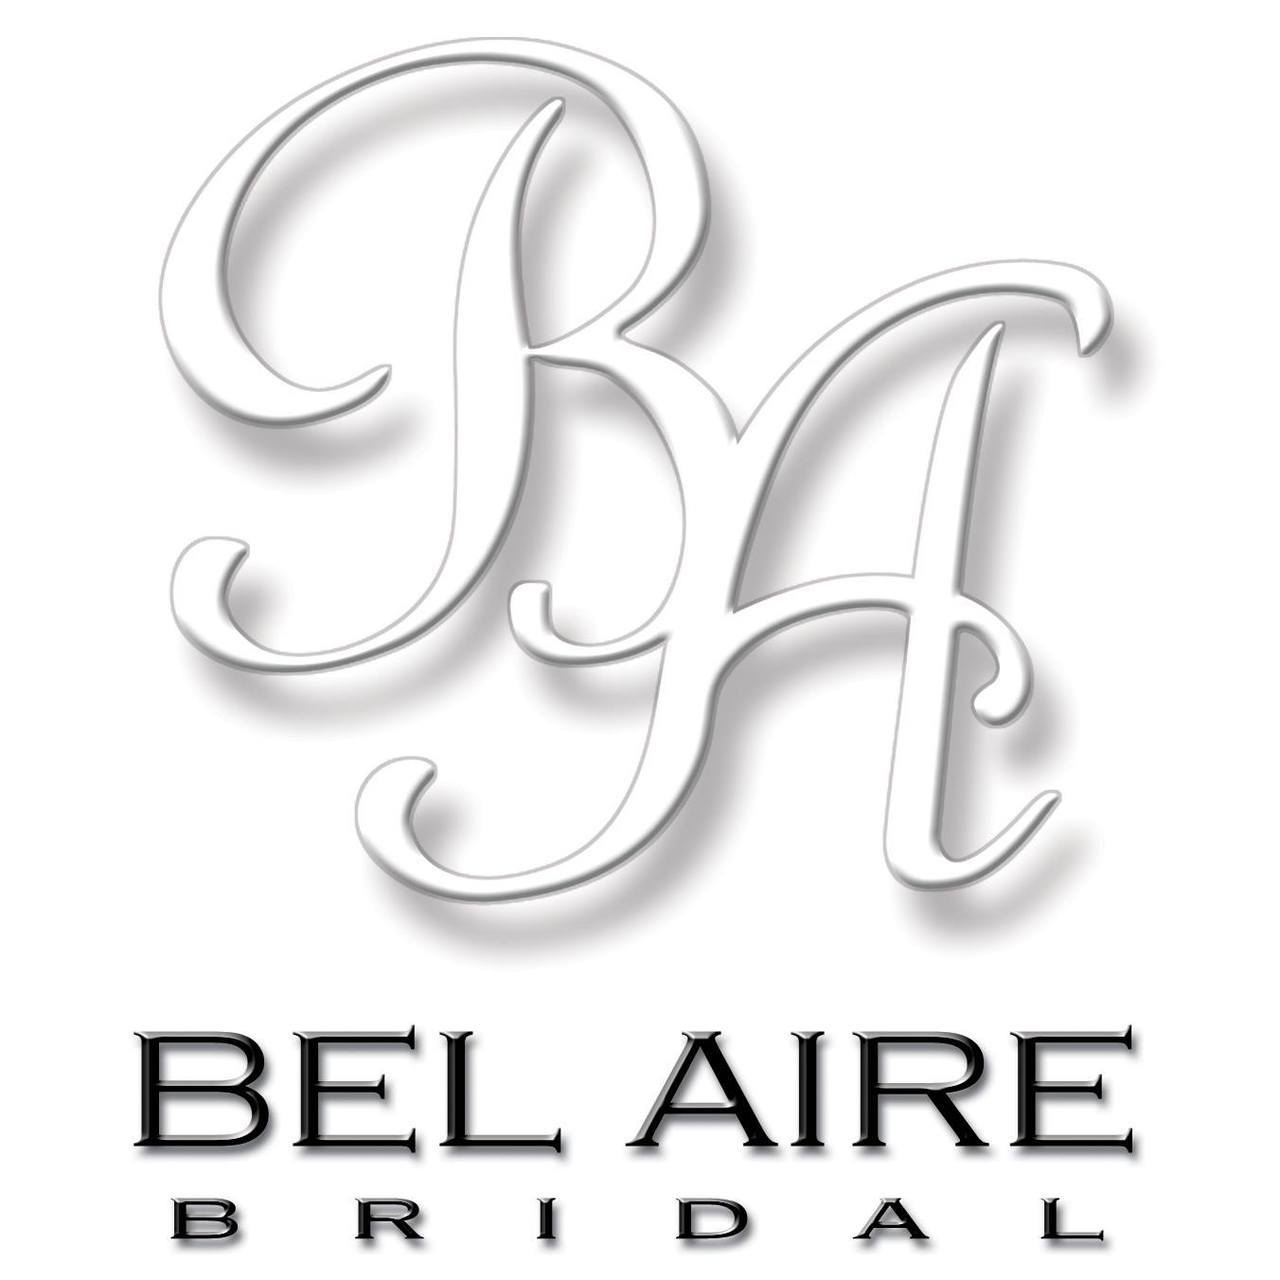 Bel_Aire_Bridal_Logo__76875.1404995565.1280.1280.jpg